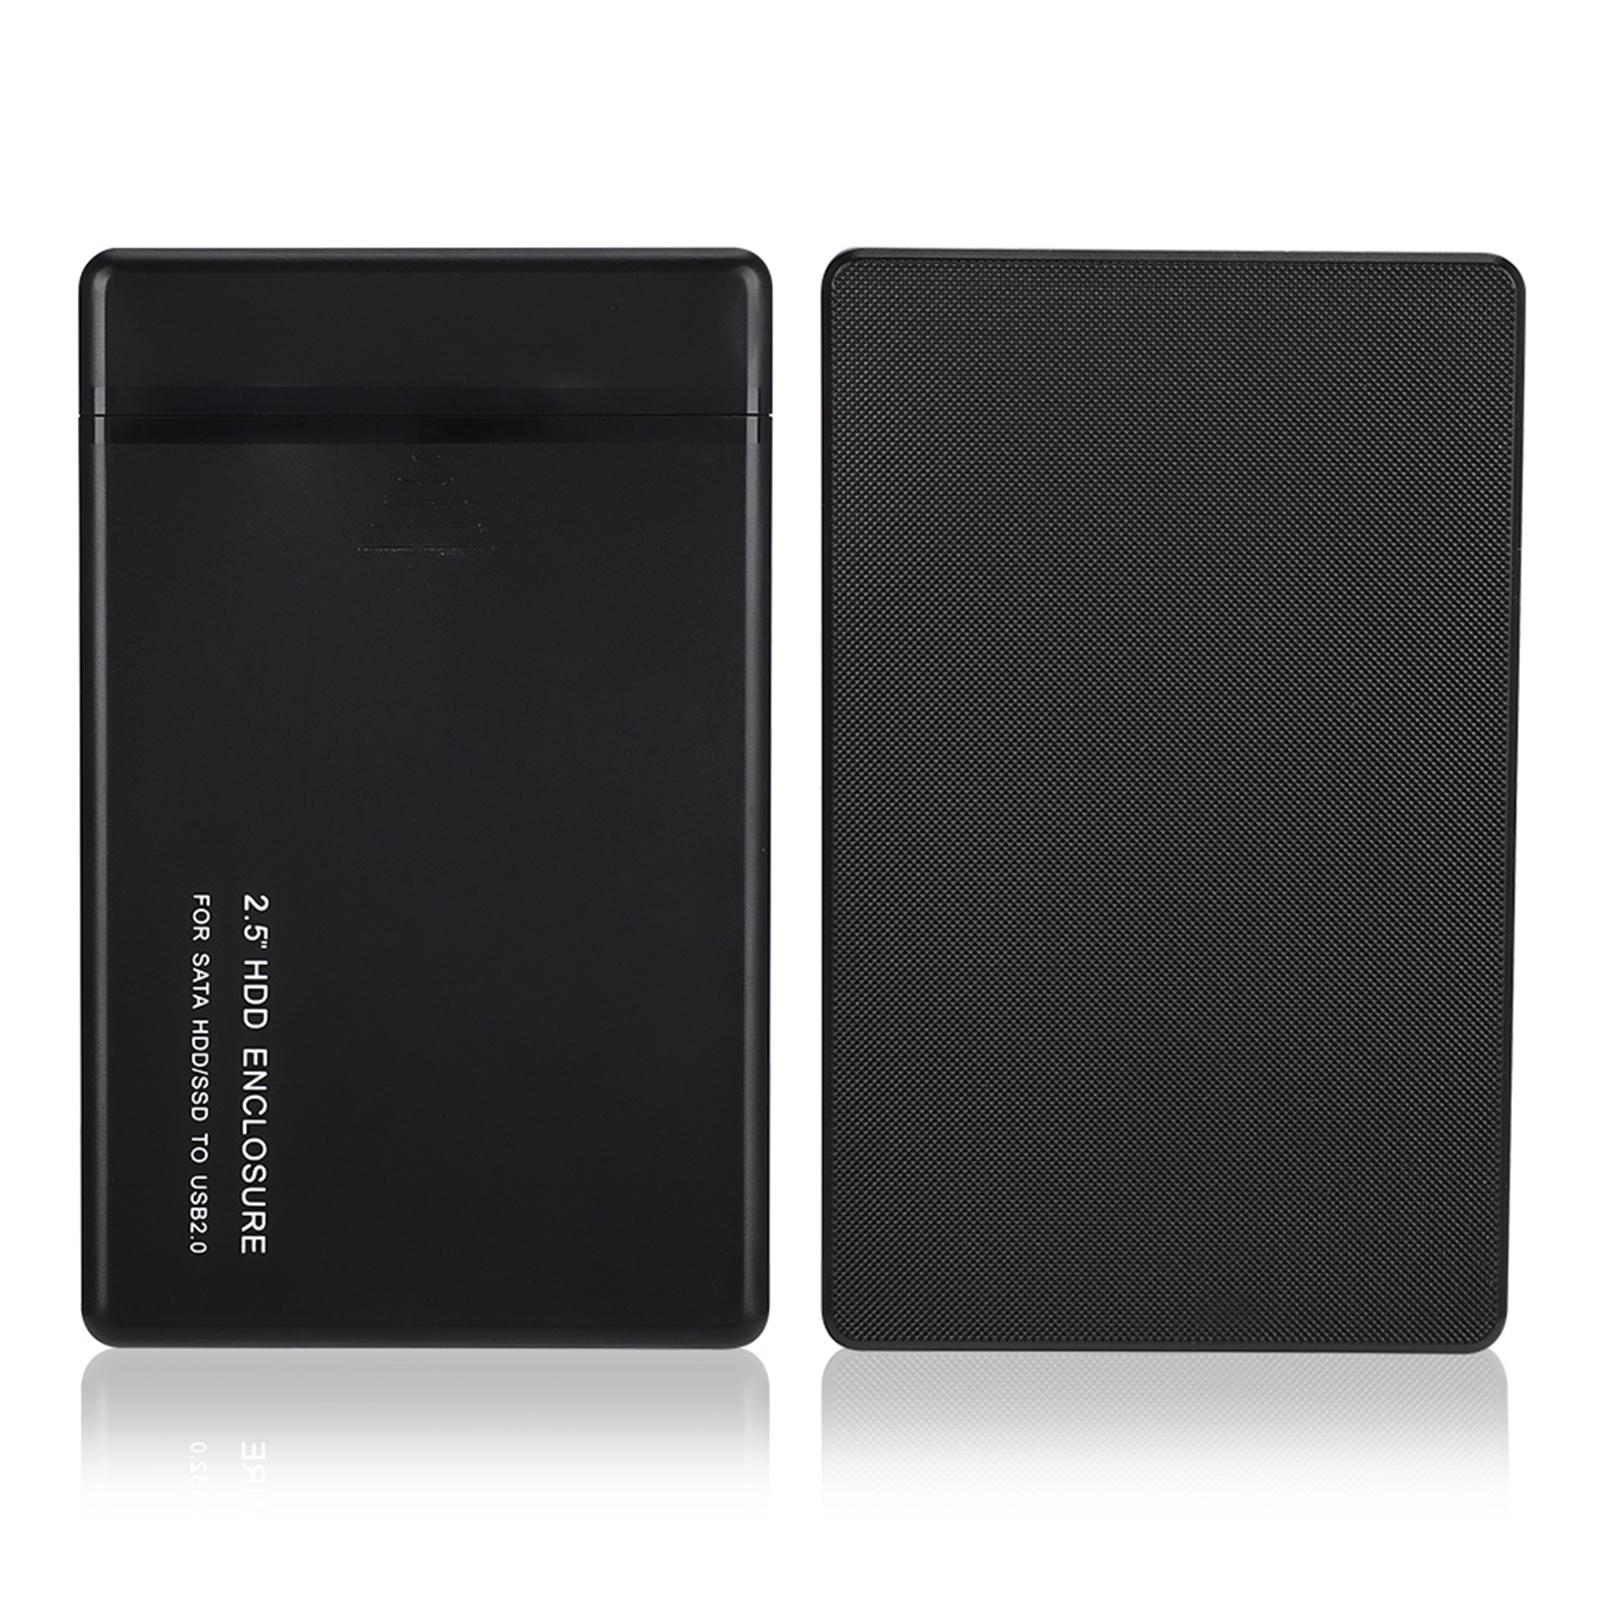 2-5-034-USB-2-0-SATA-External-SSD-HDD-Mobile-Solid-State-Hard-Disk-Box-Enclosure-LJ thumbnail 15